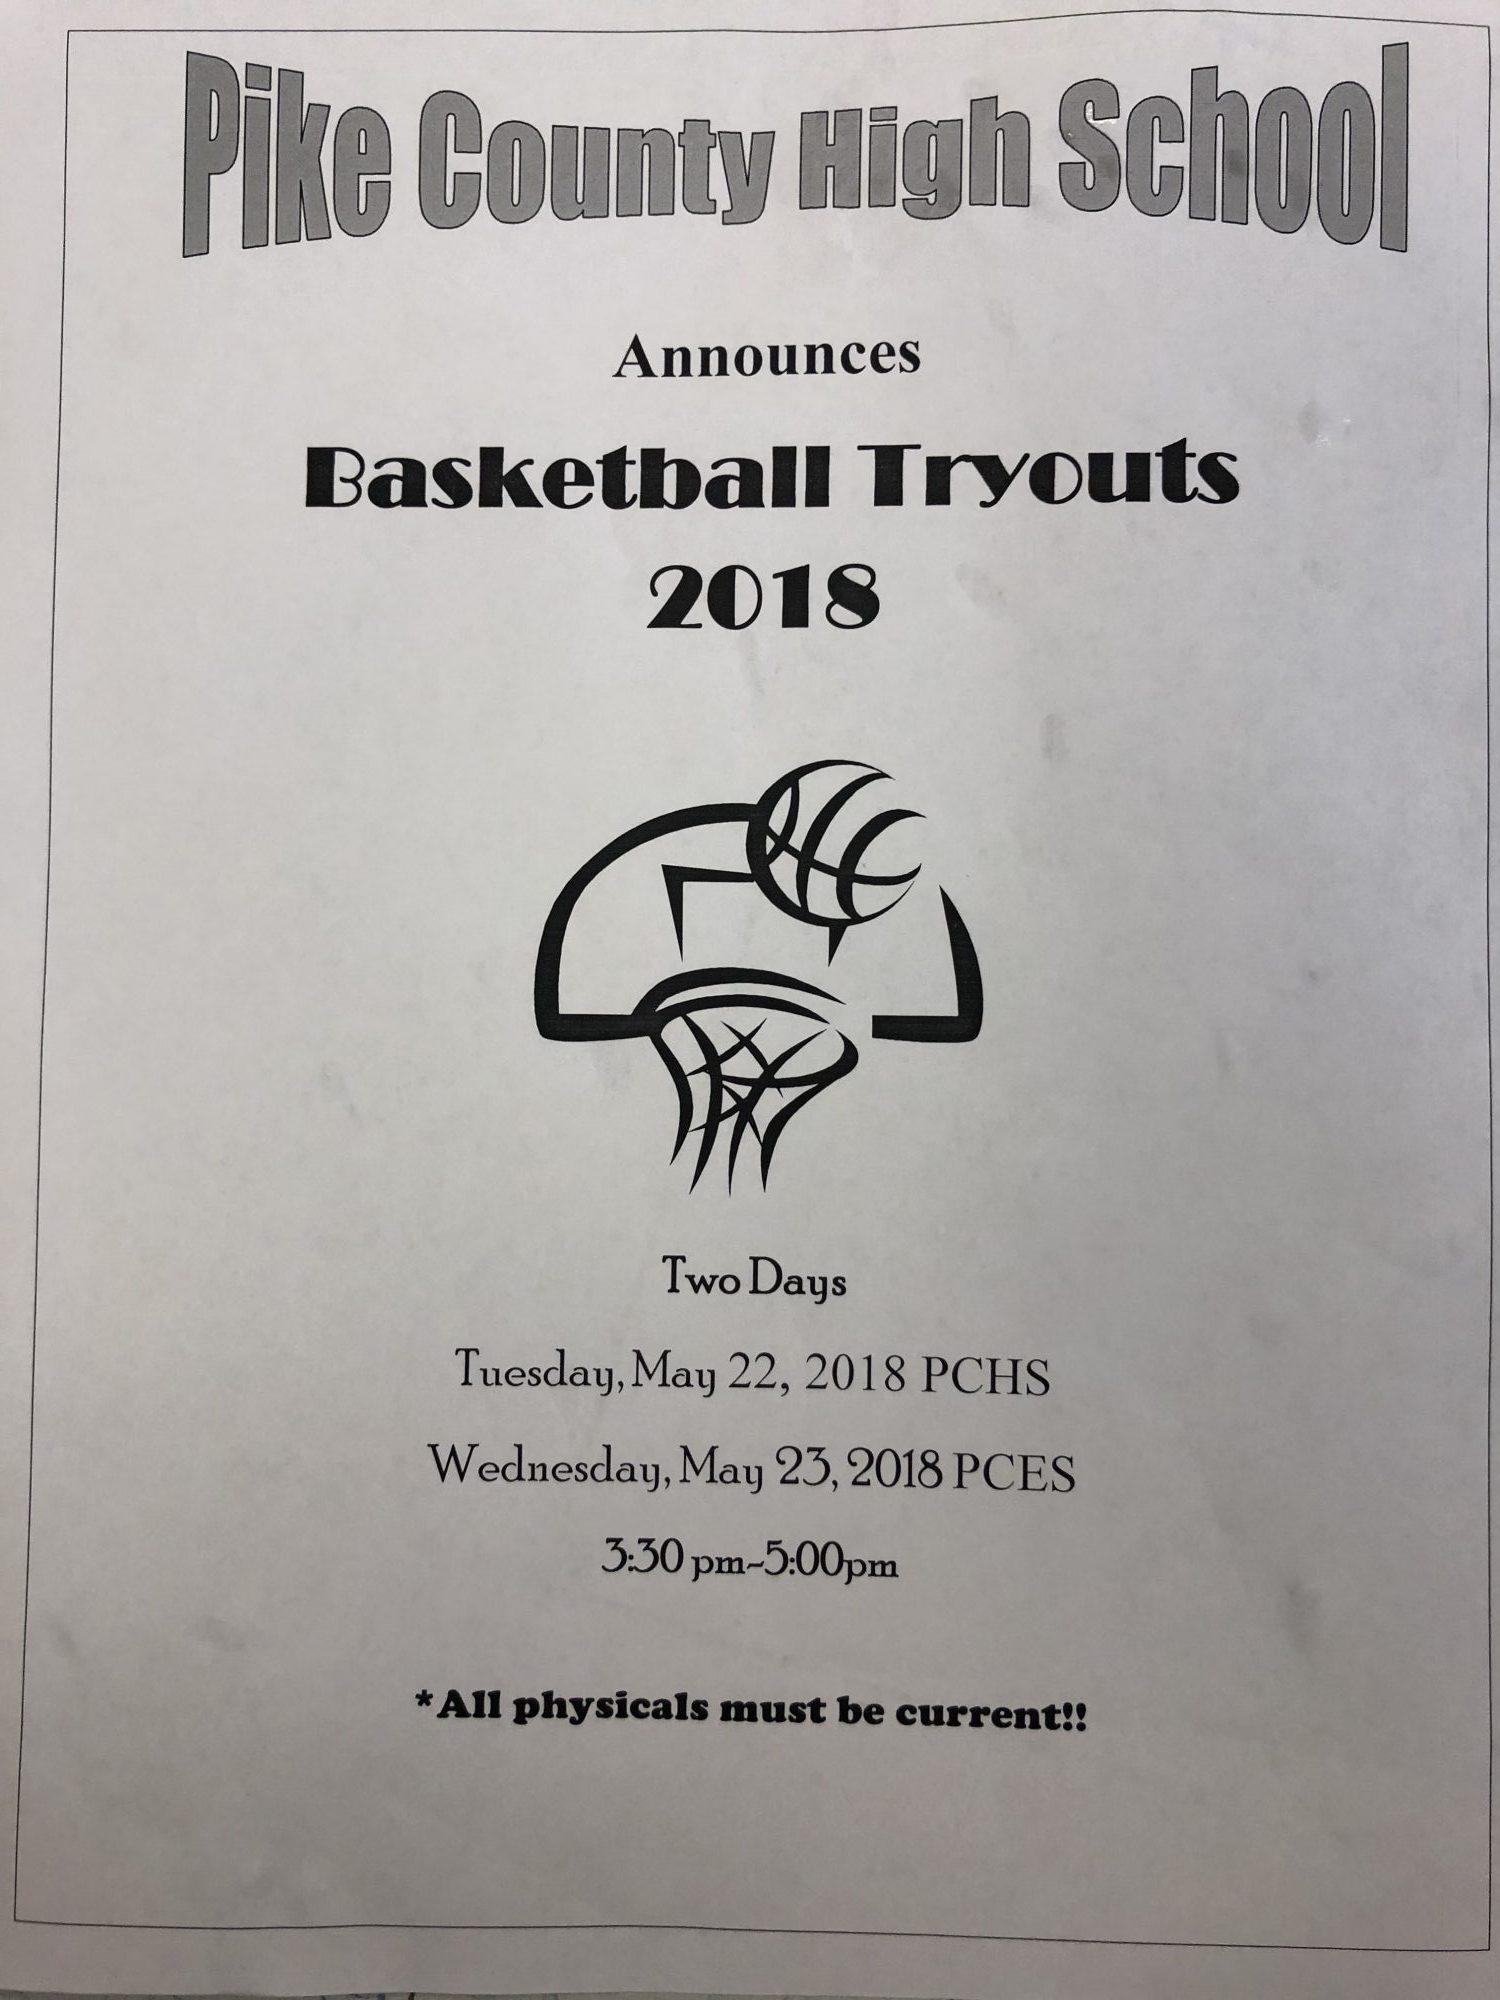 2018 Boys Basketball Tryouts